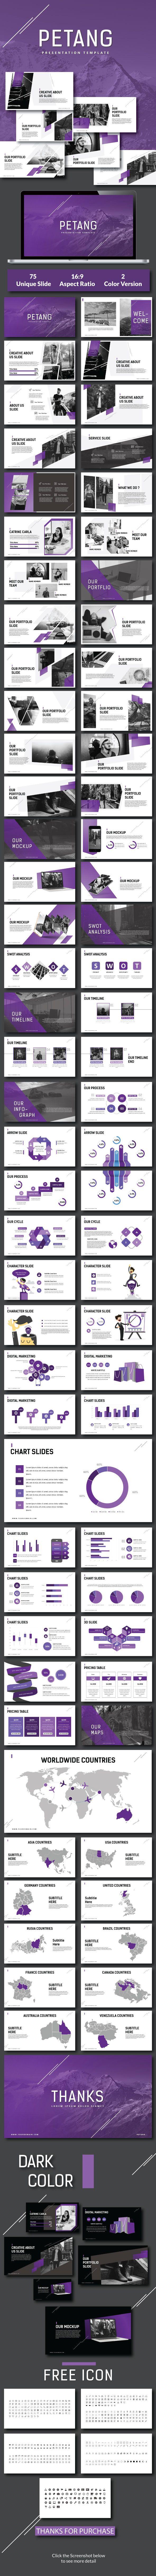 Petang - Creative PowerPoint Presentation Template - 75+ Well Designed Slides